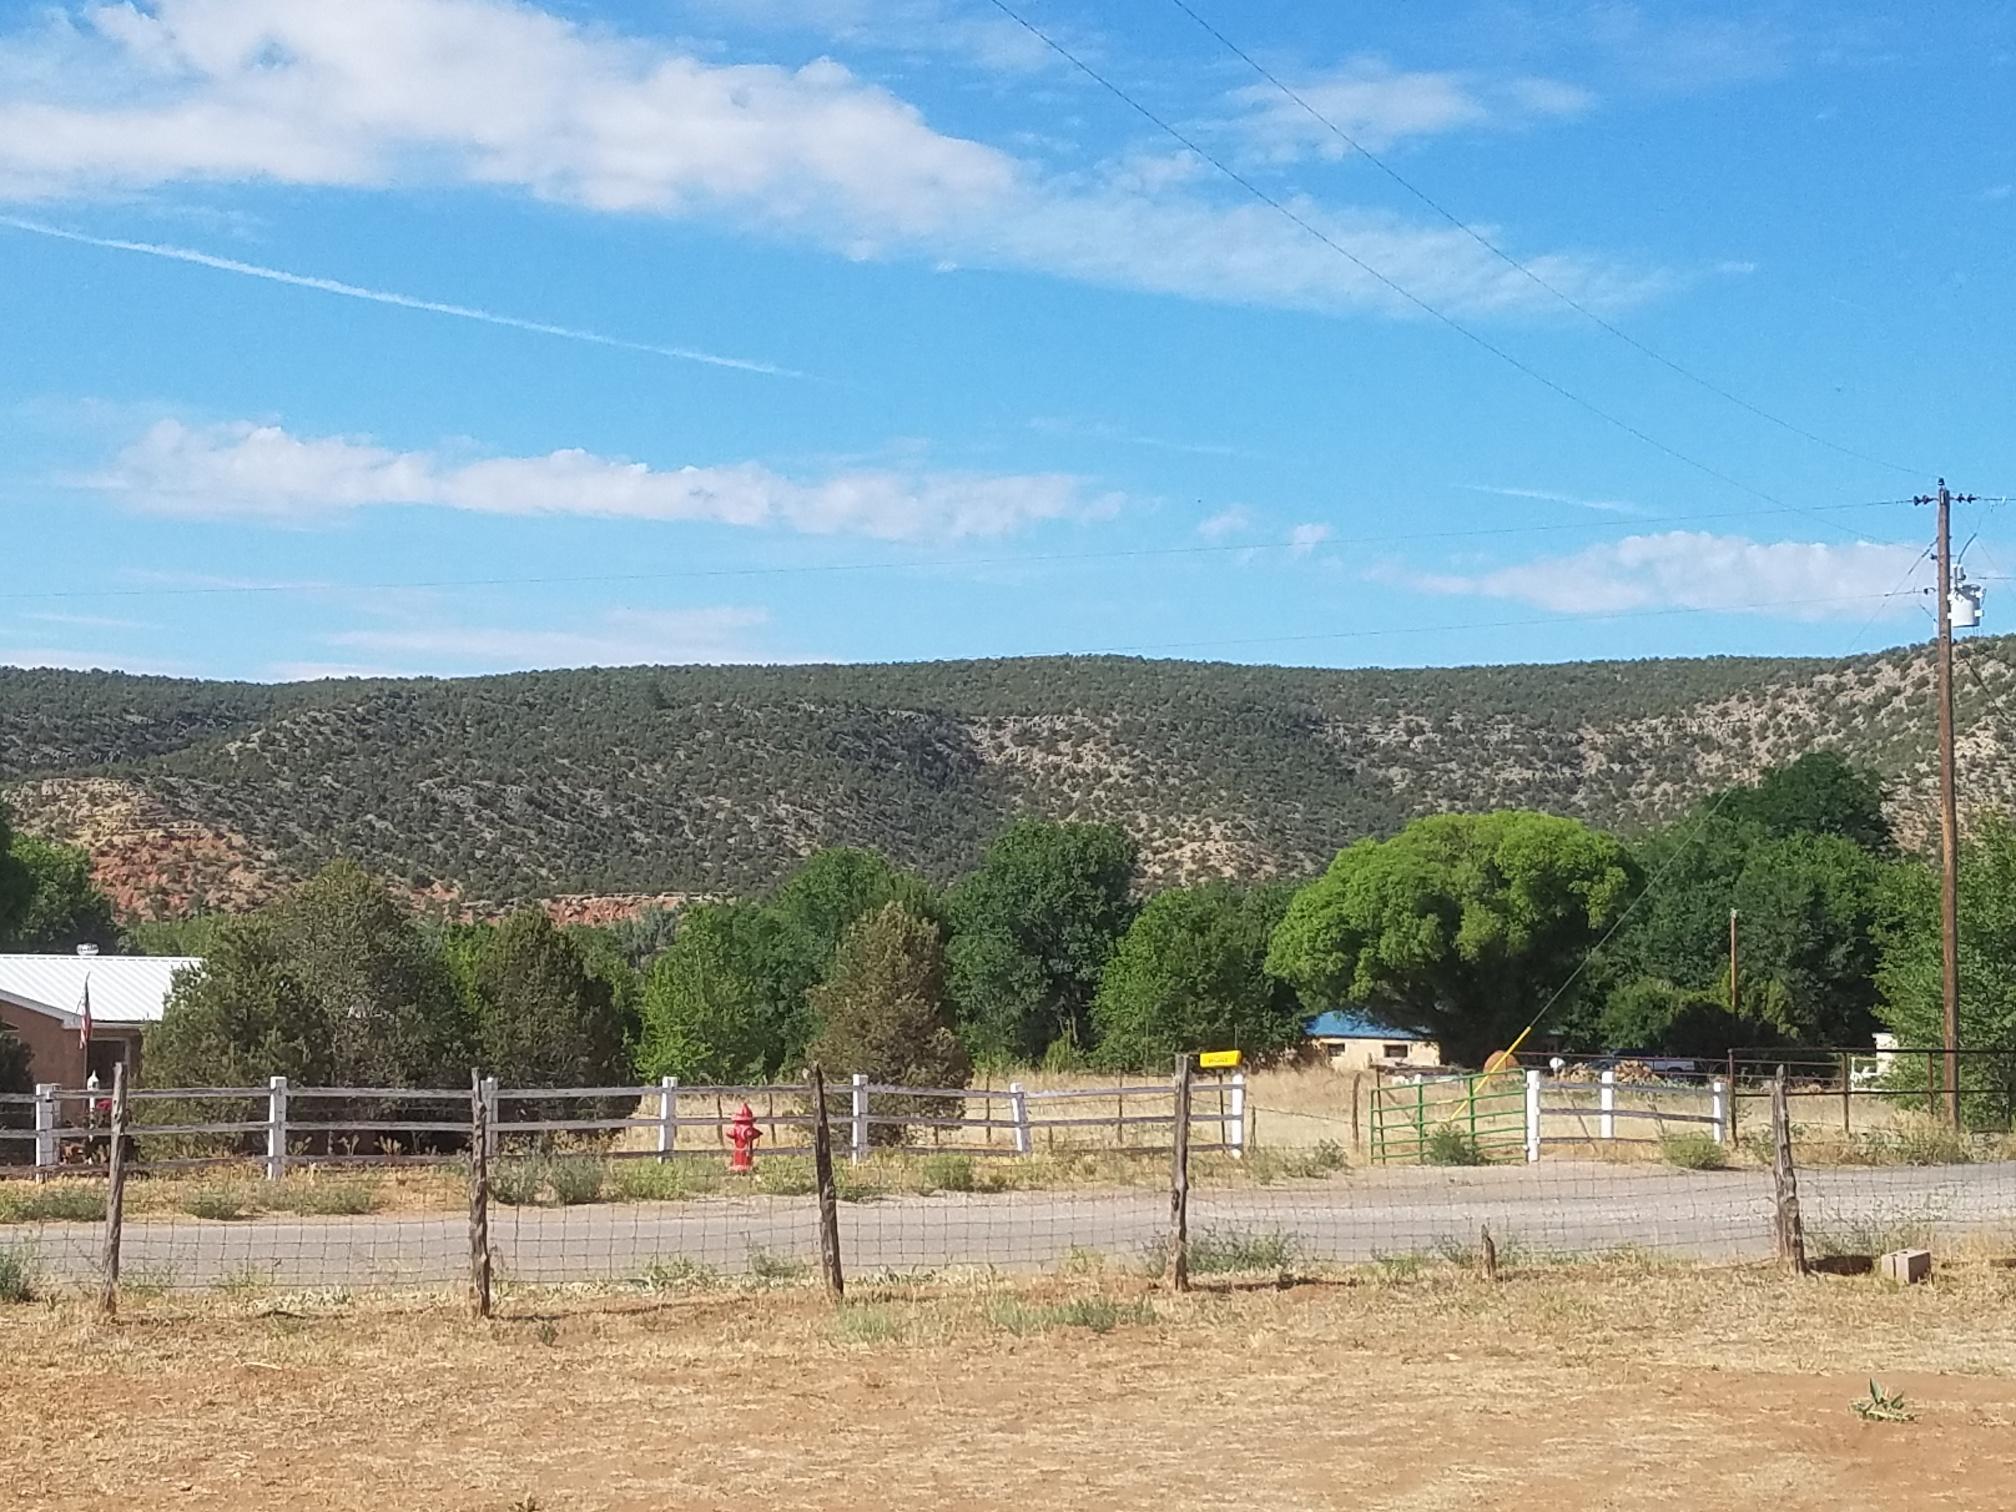 29 County Road B29E Property Photo - Villanueva, NM real estate listing